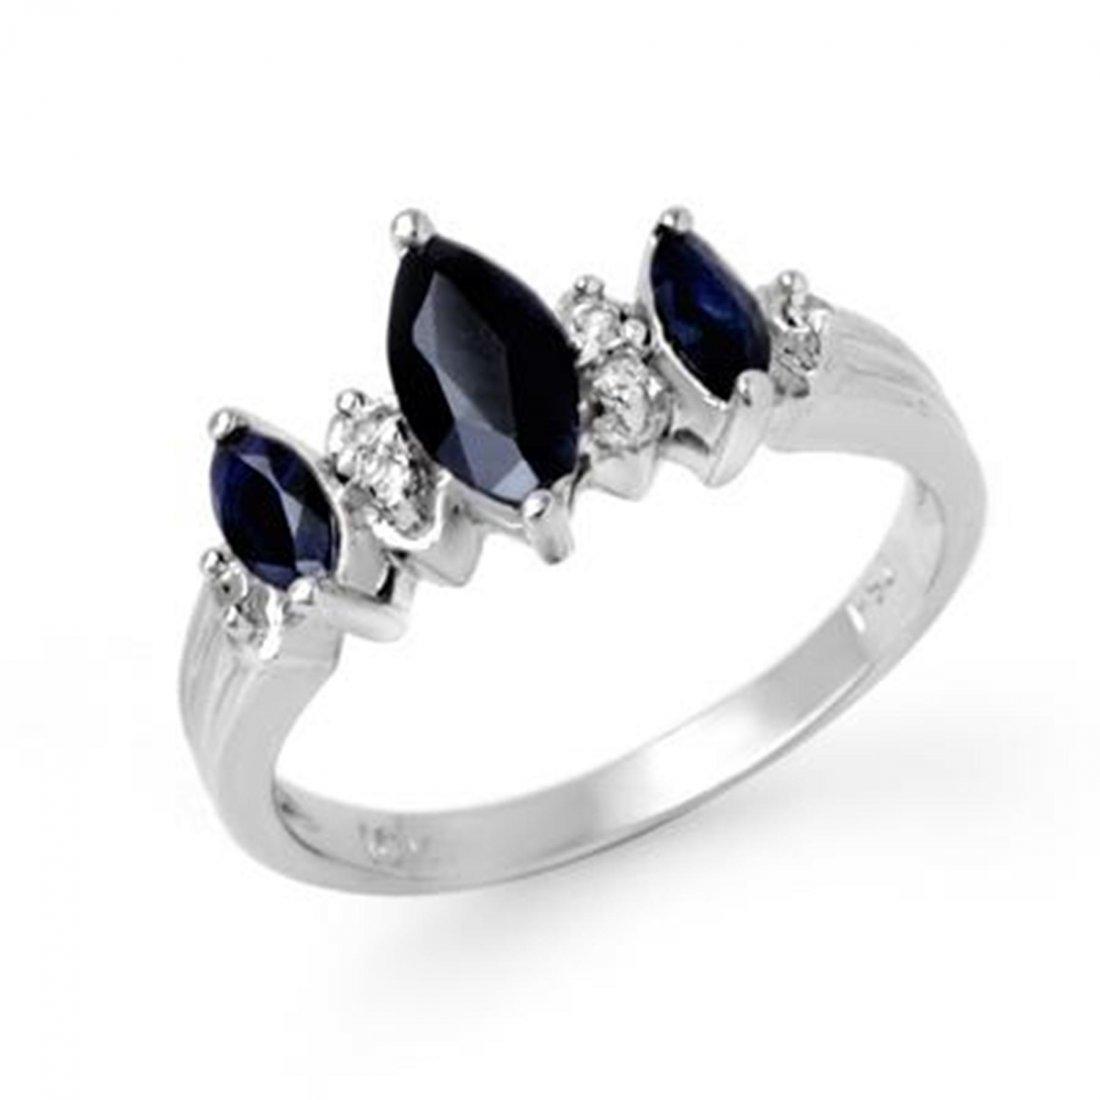 1J: Genuine 1.0 ctw Sapphire & Diamond Ring 10K White G